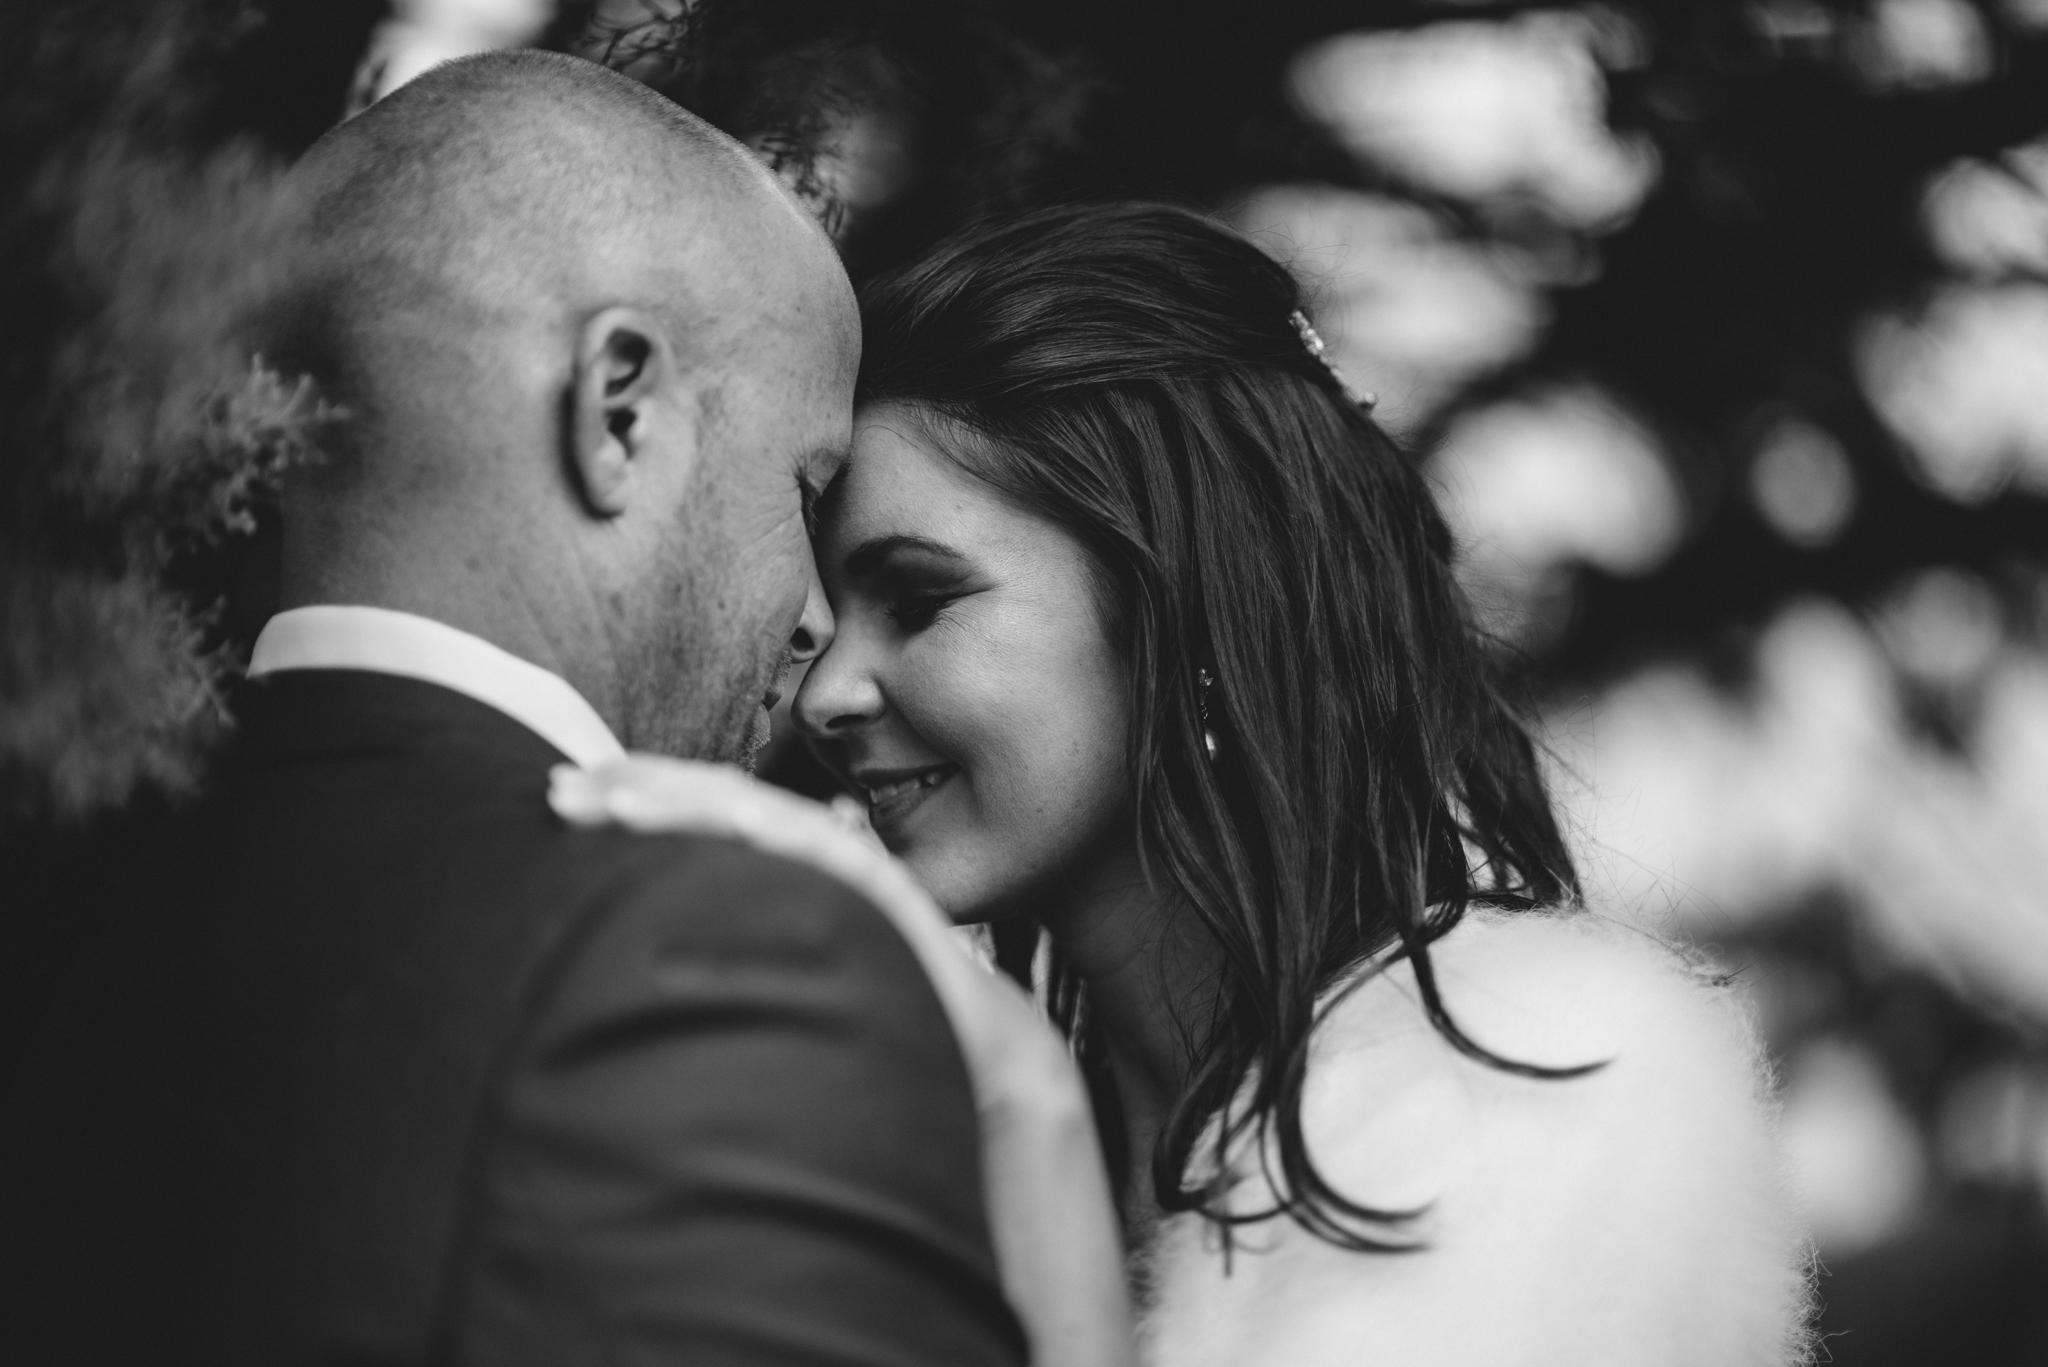 LOVELENSCAPES PHOTOGRAPHY • VISUAL POETRY • NEW ZEALAND WEDDING PHOTOGRAPHER • AUSTRALIAN WEDDING PHOTOGRAPHER • BRISBANE • MELBOURNE • SYDNEY • HOBART • TARUREKA ESTATE • ANNA CAMPBELL • 153.jpg